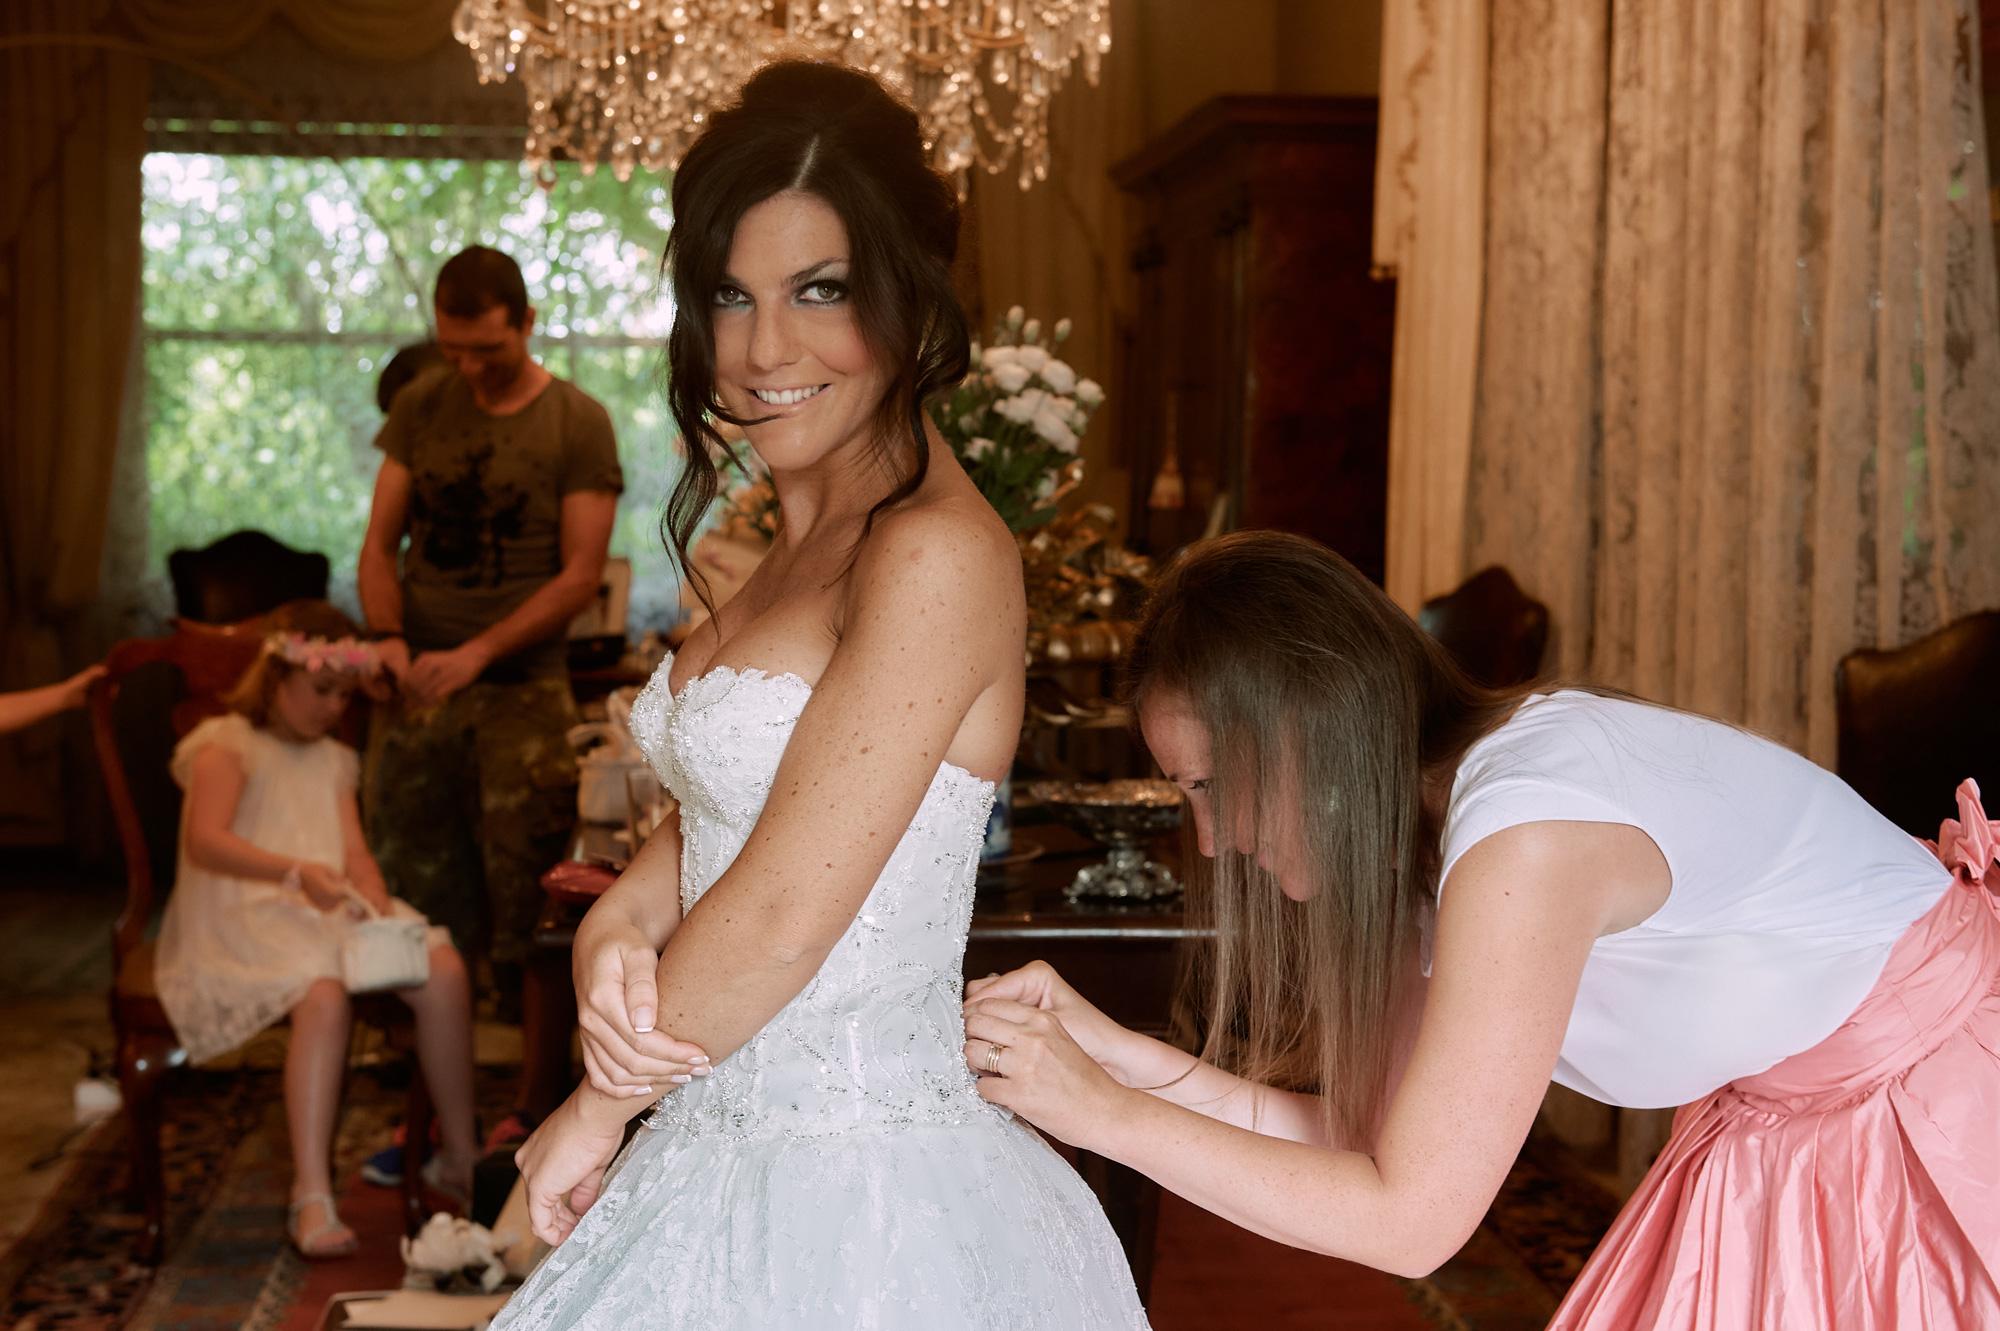 2 - ivano_di_maria_fotografo_matrimonio_ eli_franc